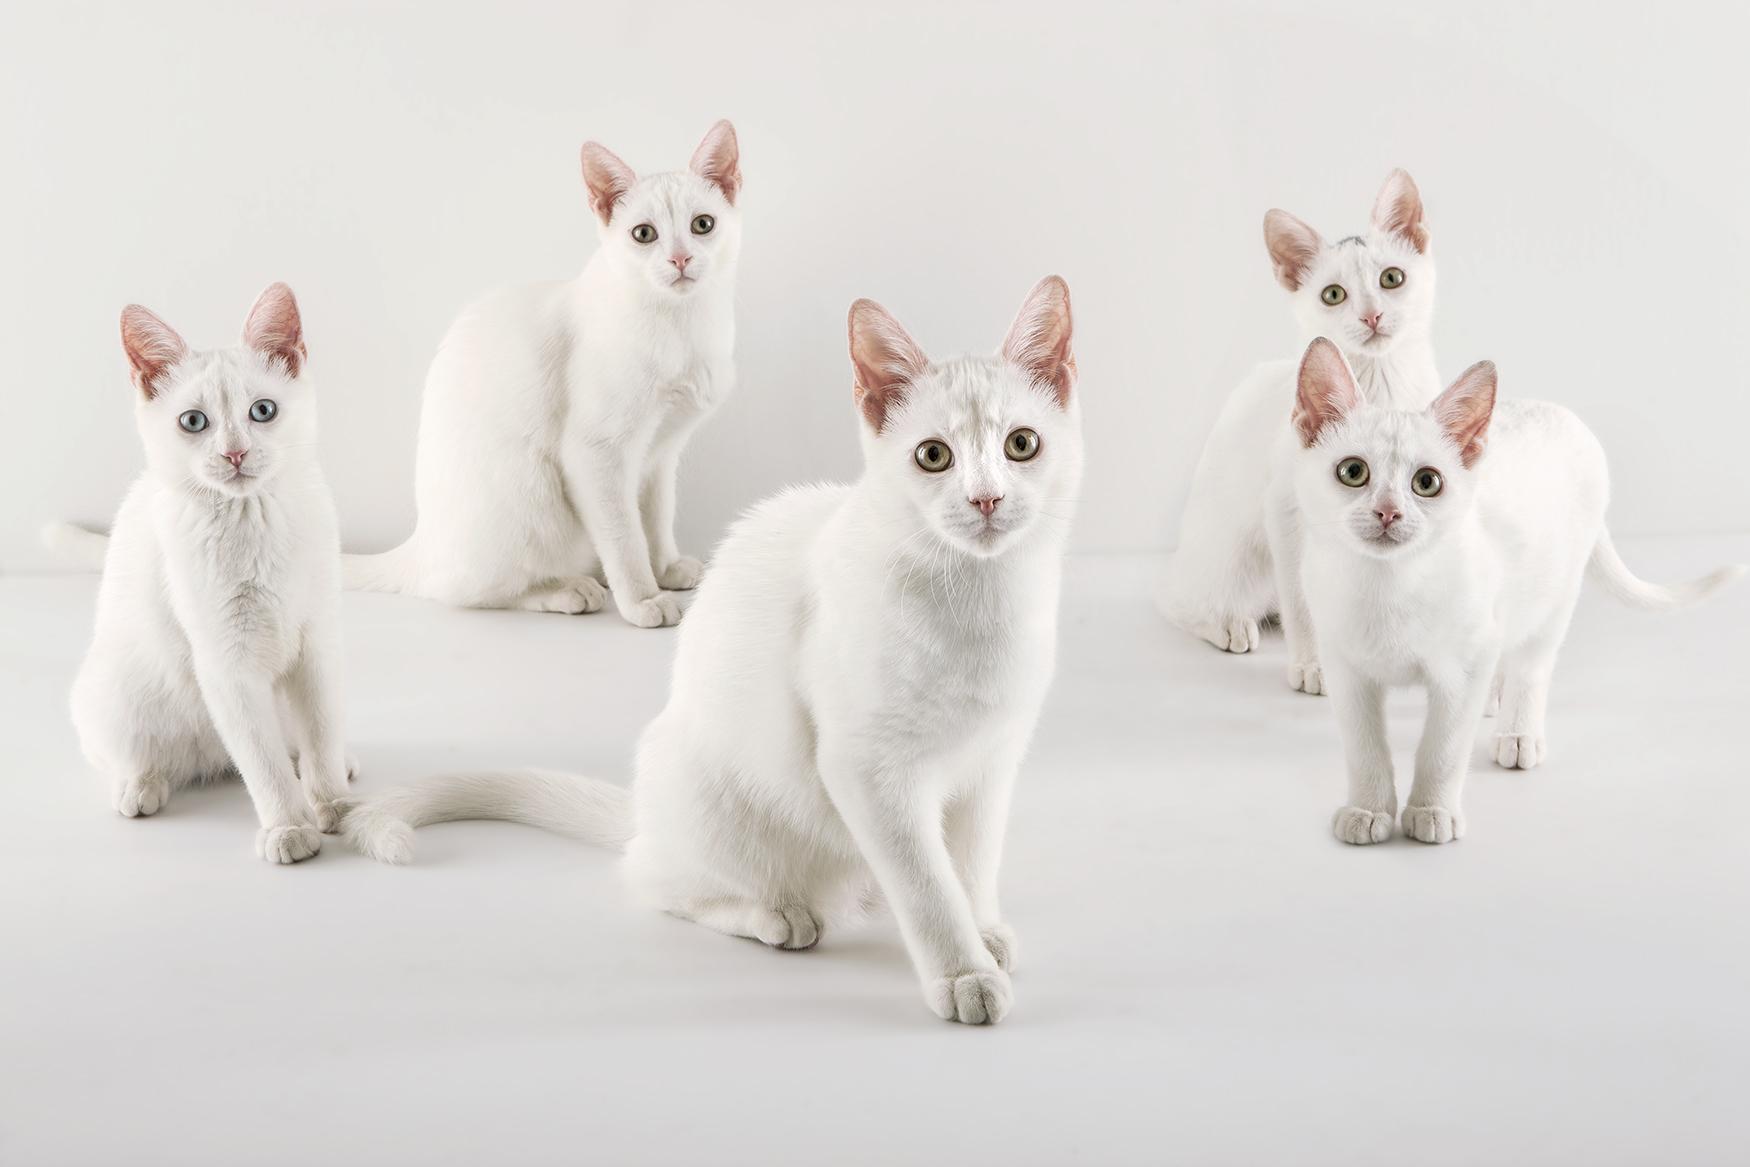 Morgan_whitecats7078_small.jpg